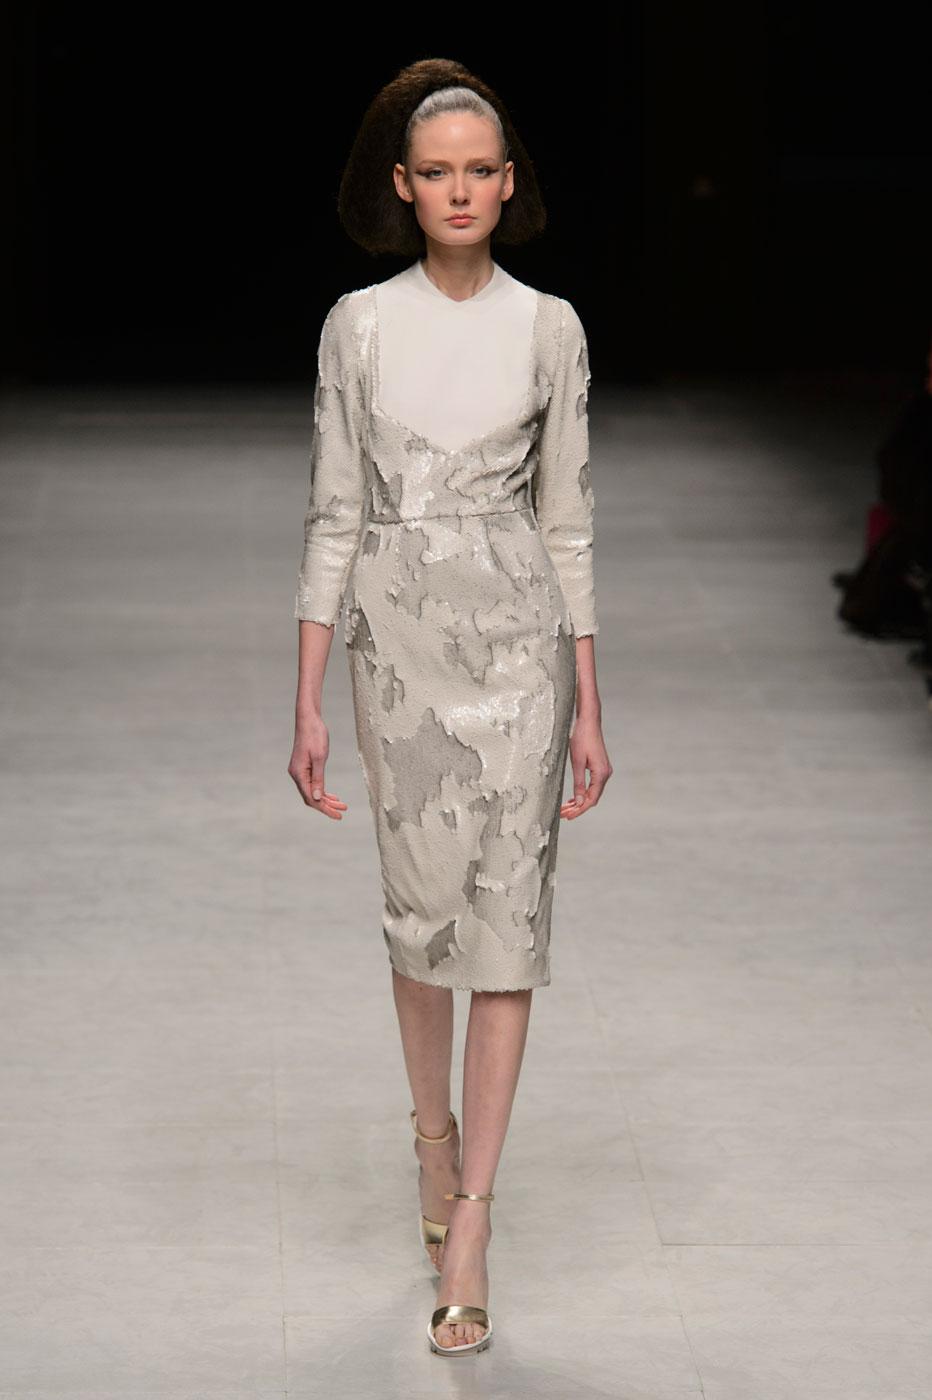 Julien-Fournie-Prive-fashion-runway-show-haute-couture-paris-spring-2015-the-impression-02